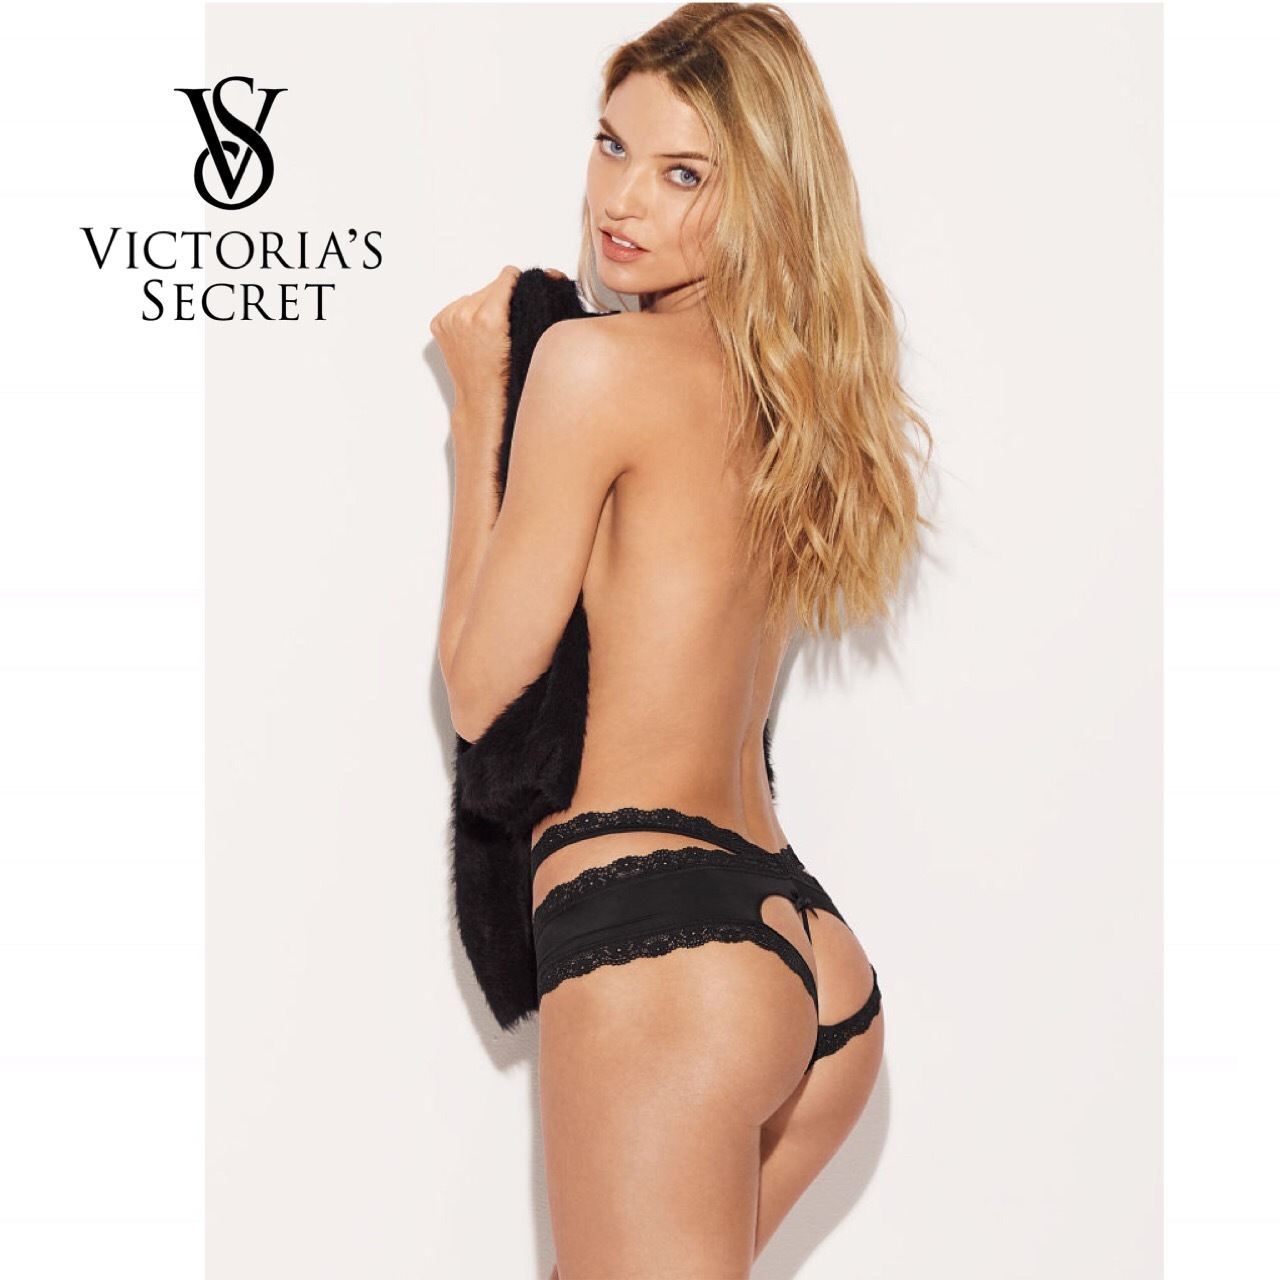 VICTORIA'S SECRET 可愛いハート ★ Cheeky Panty ★スタイル写真